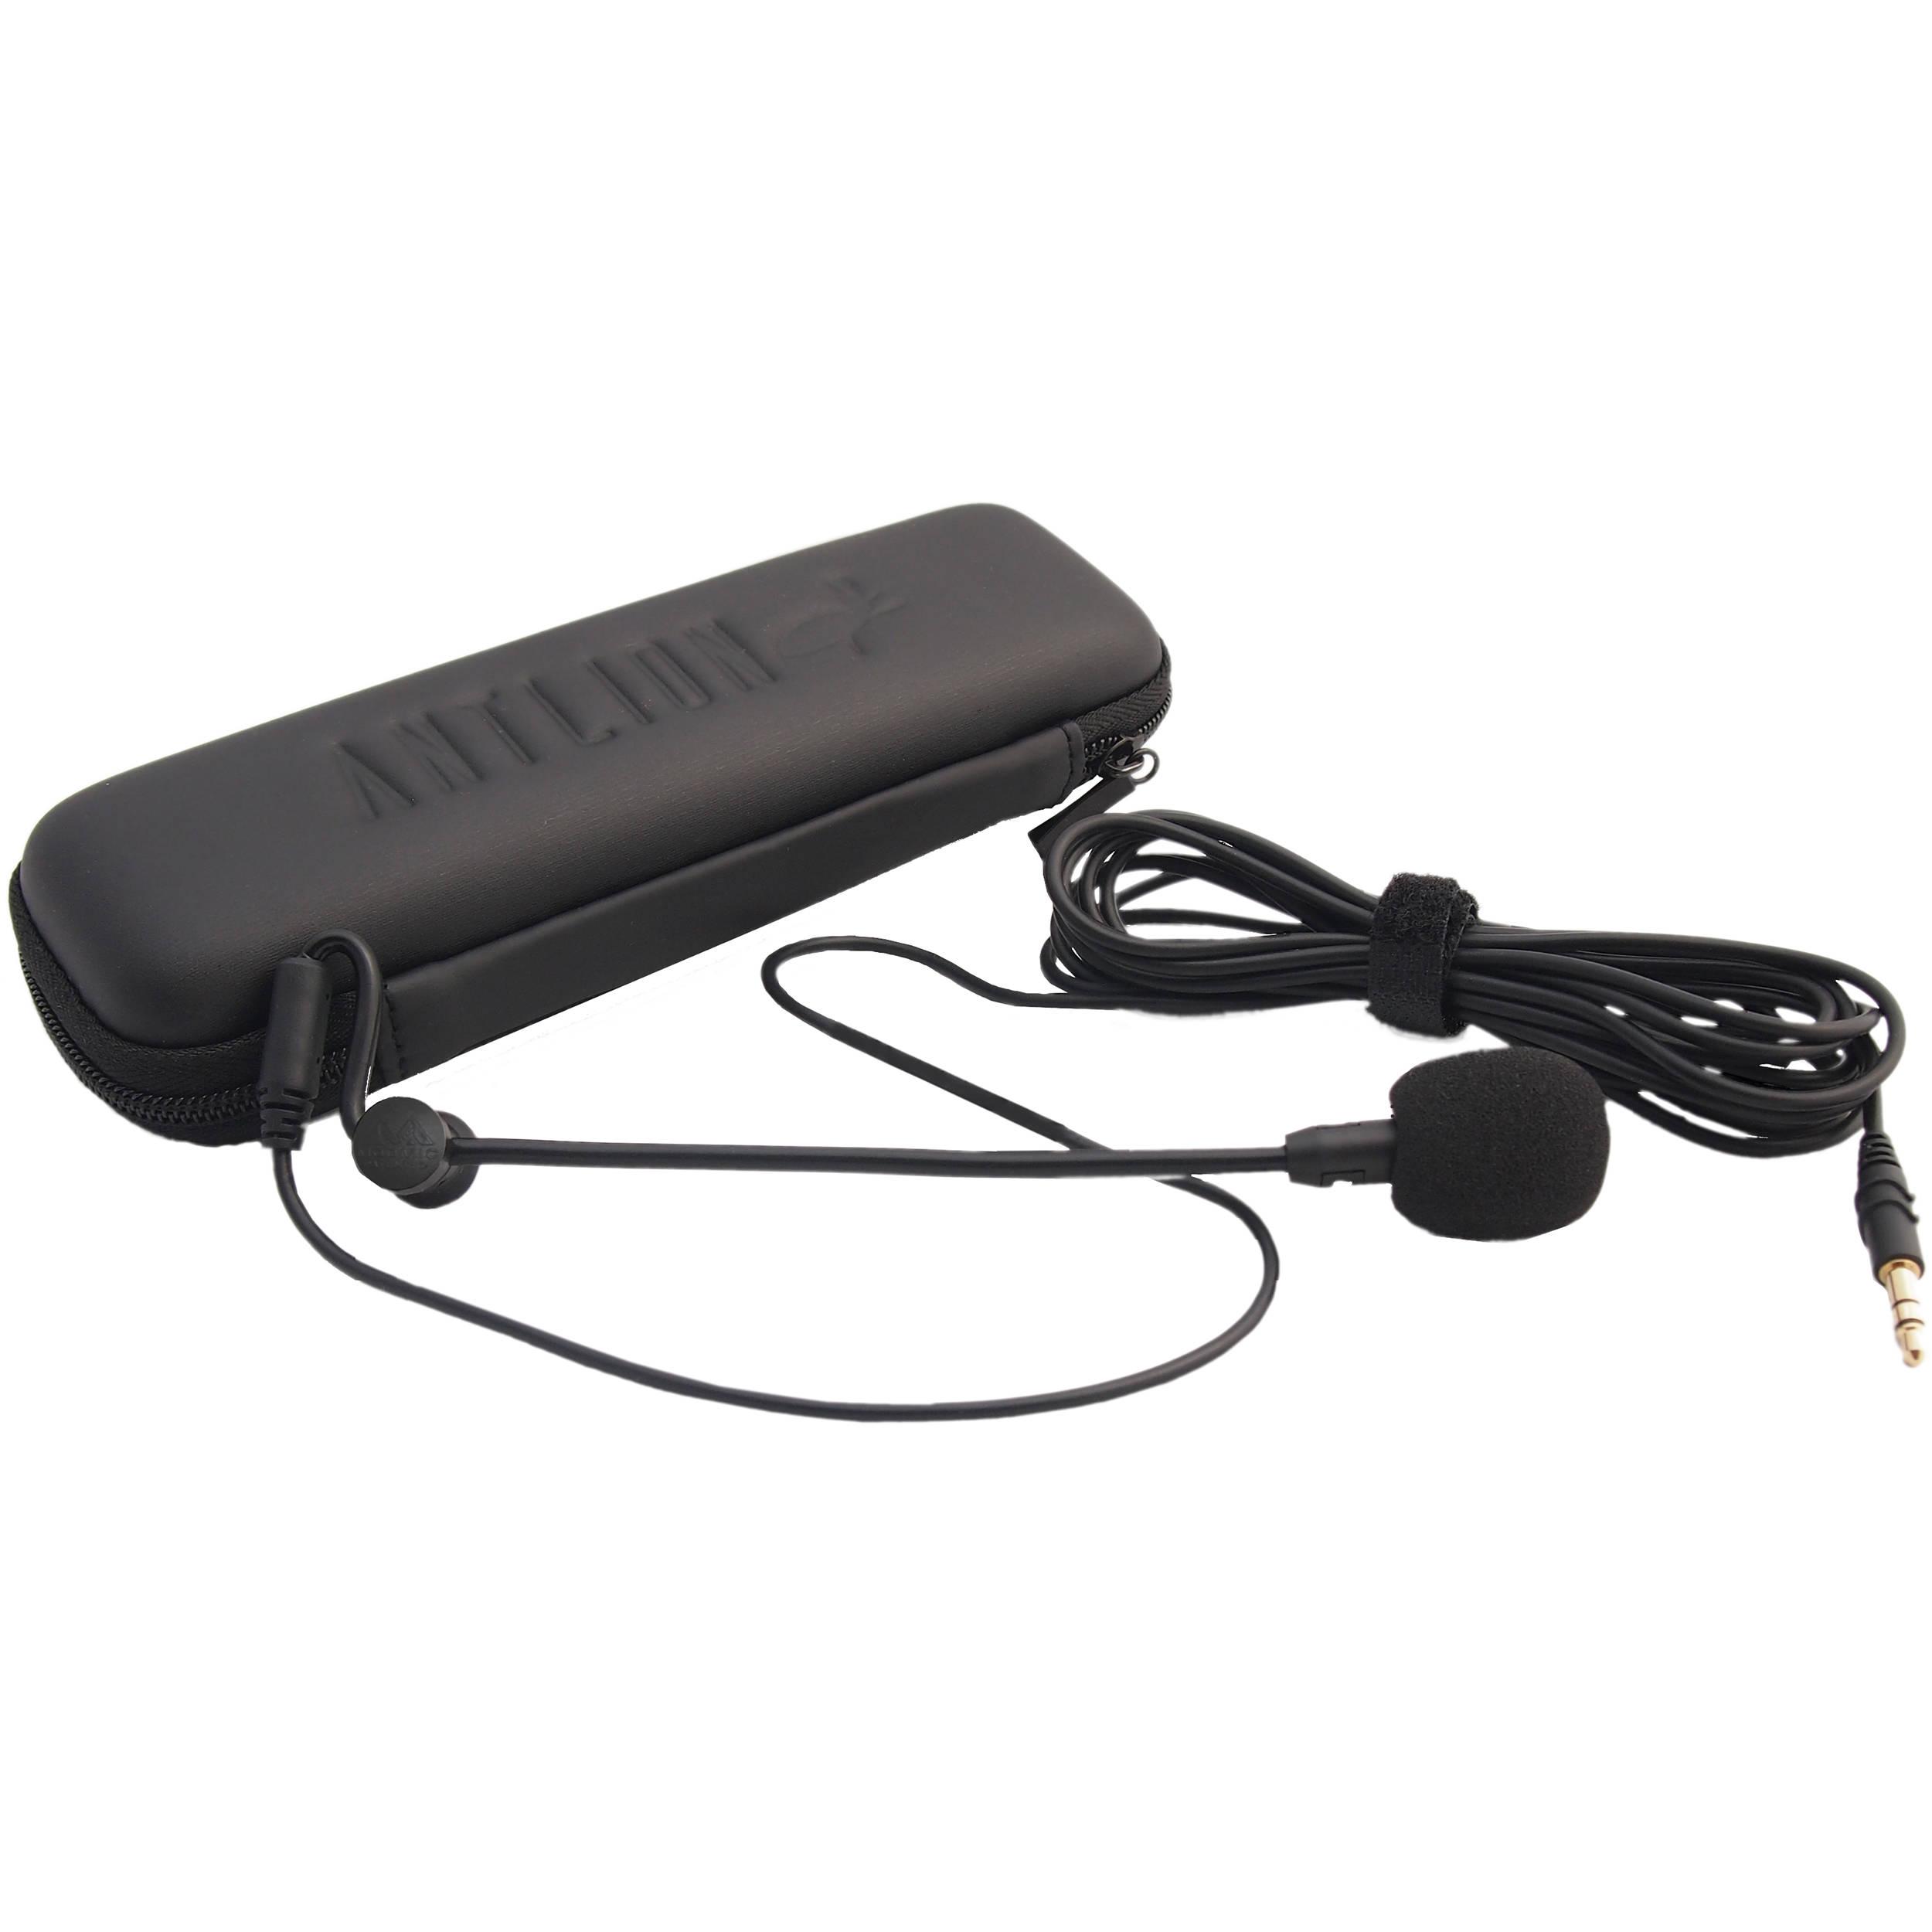 Antlion Audio ModMic 4 0 (Cardioid)